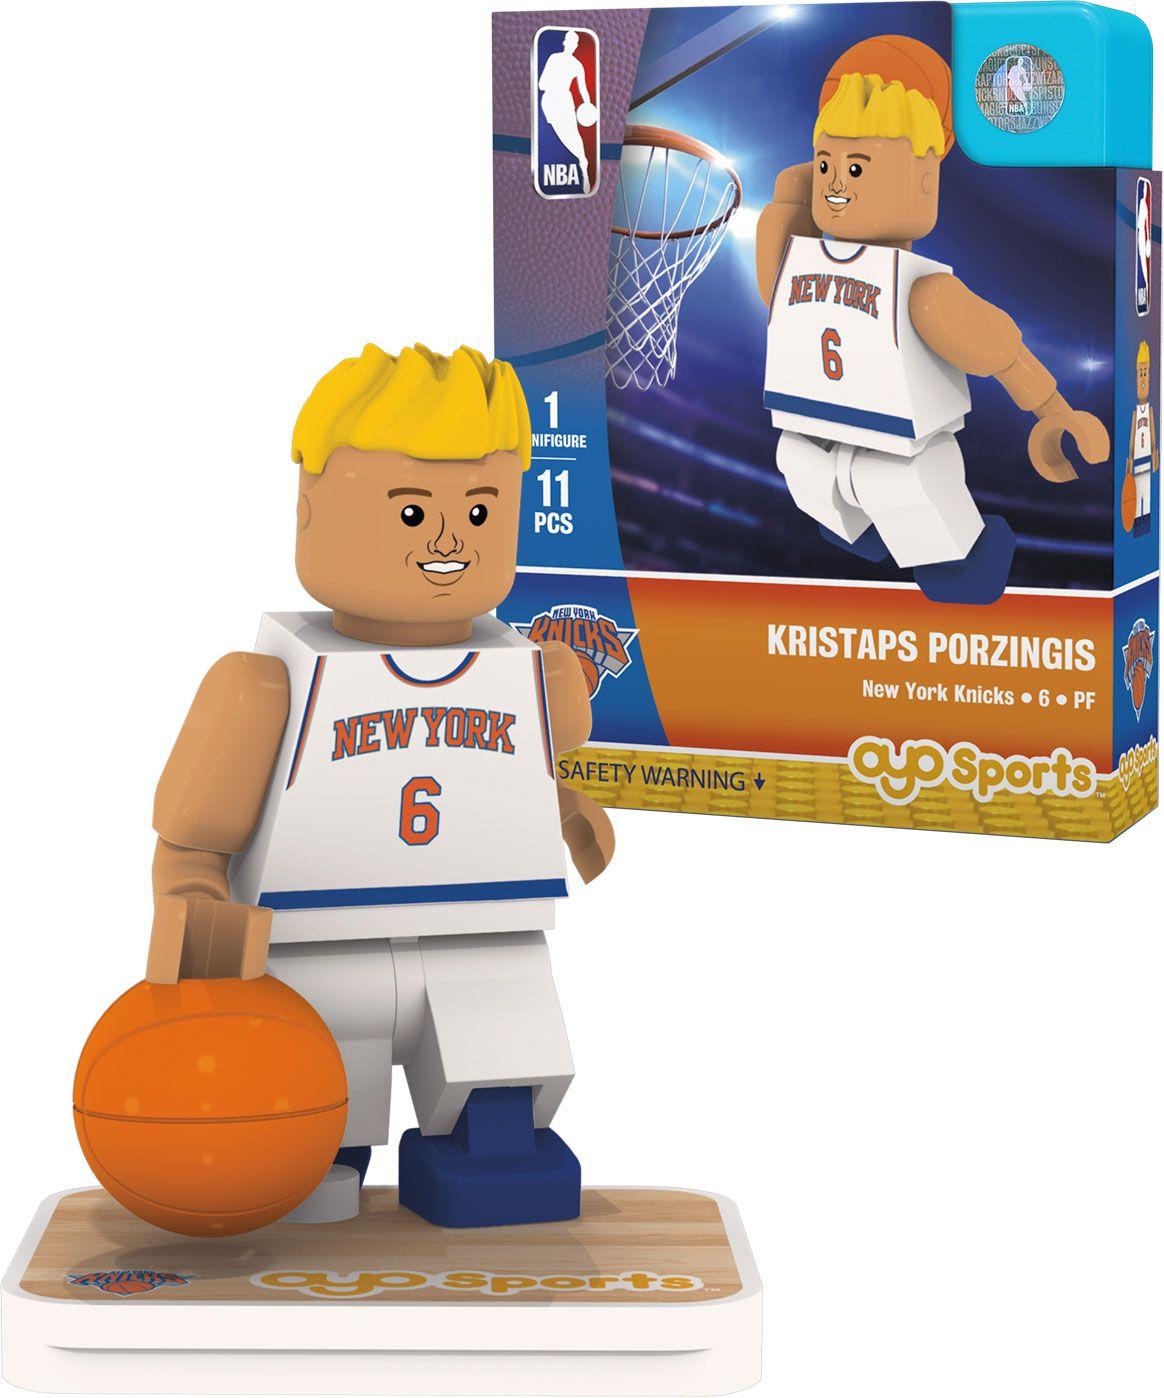 Oyo New York Knicks Kristaps Porzingis Figurine, Team